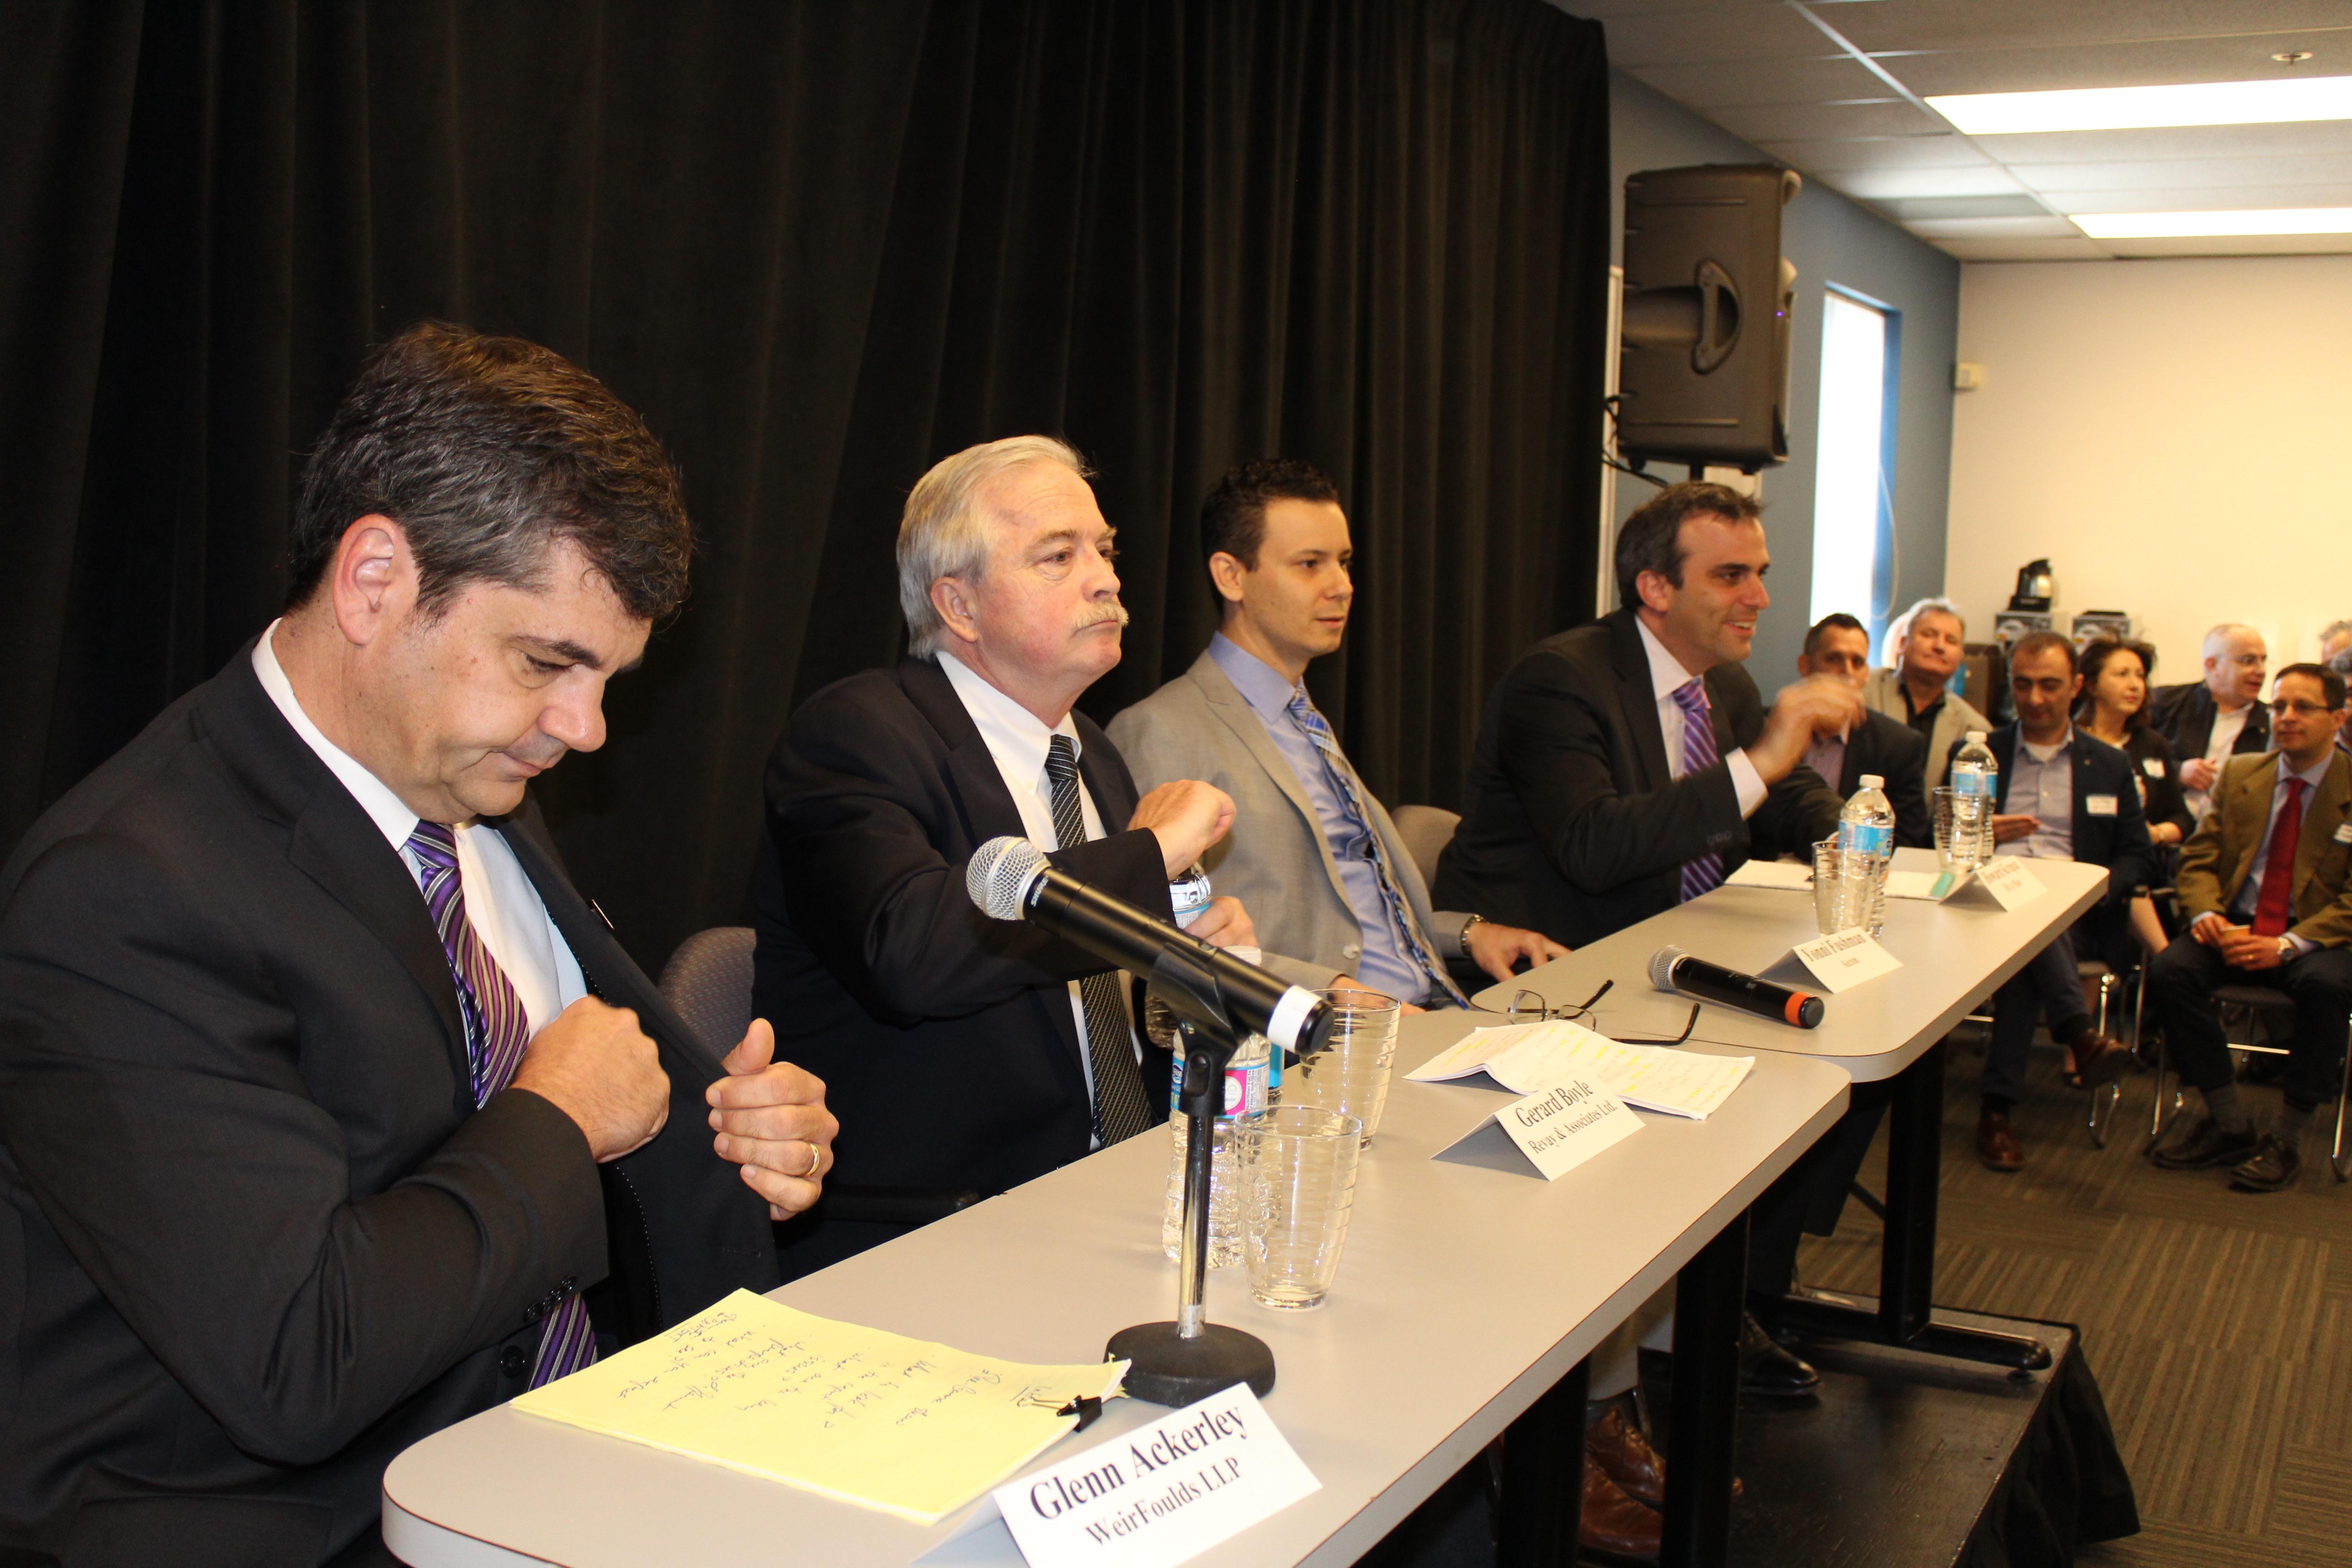 TCA members day panel